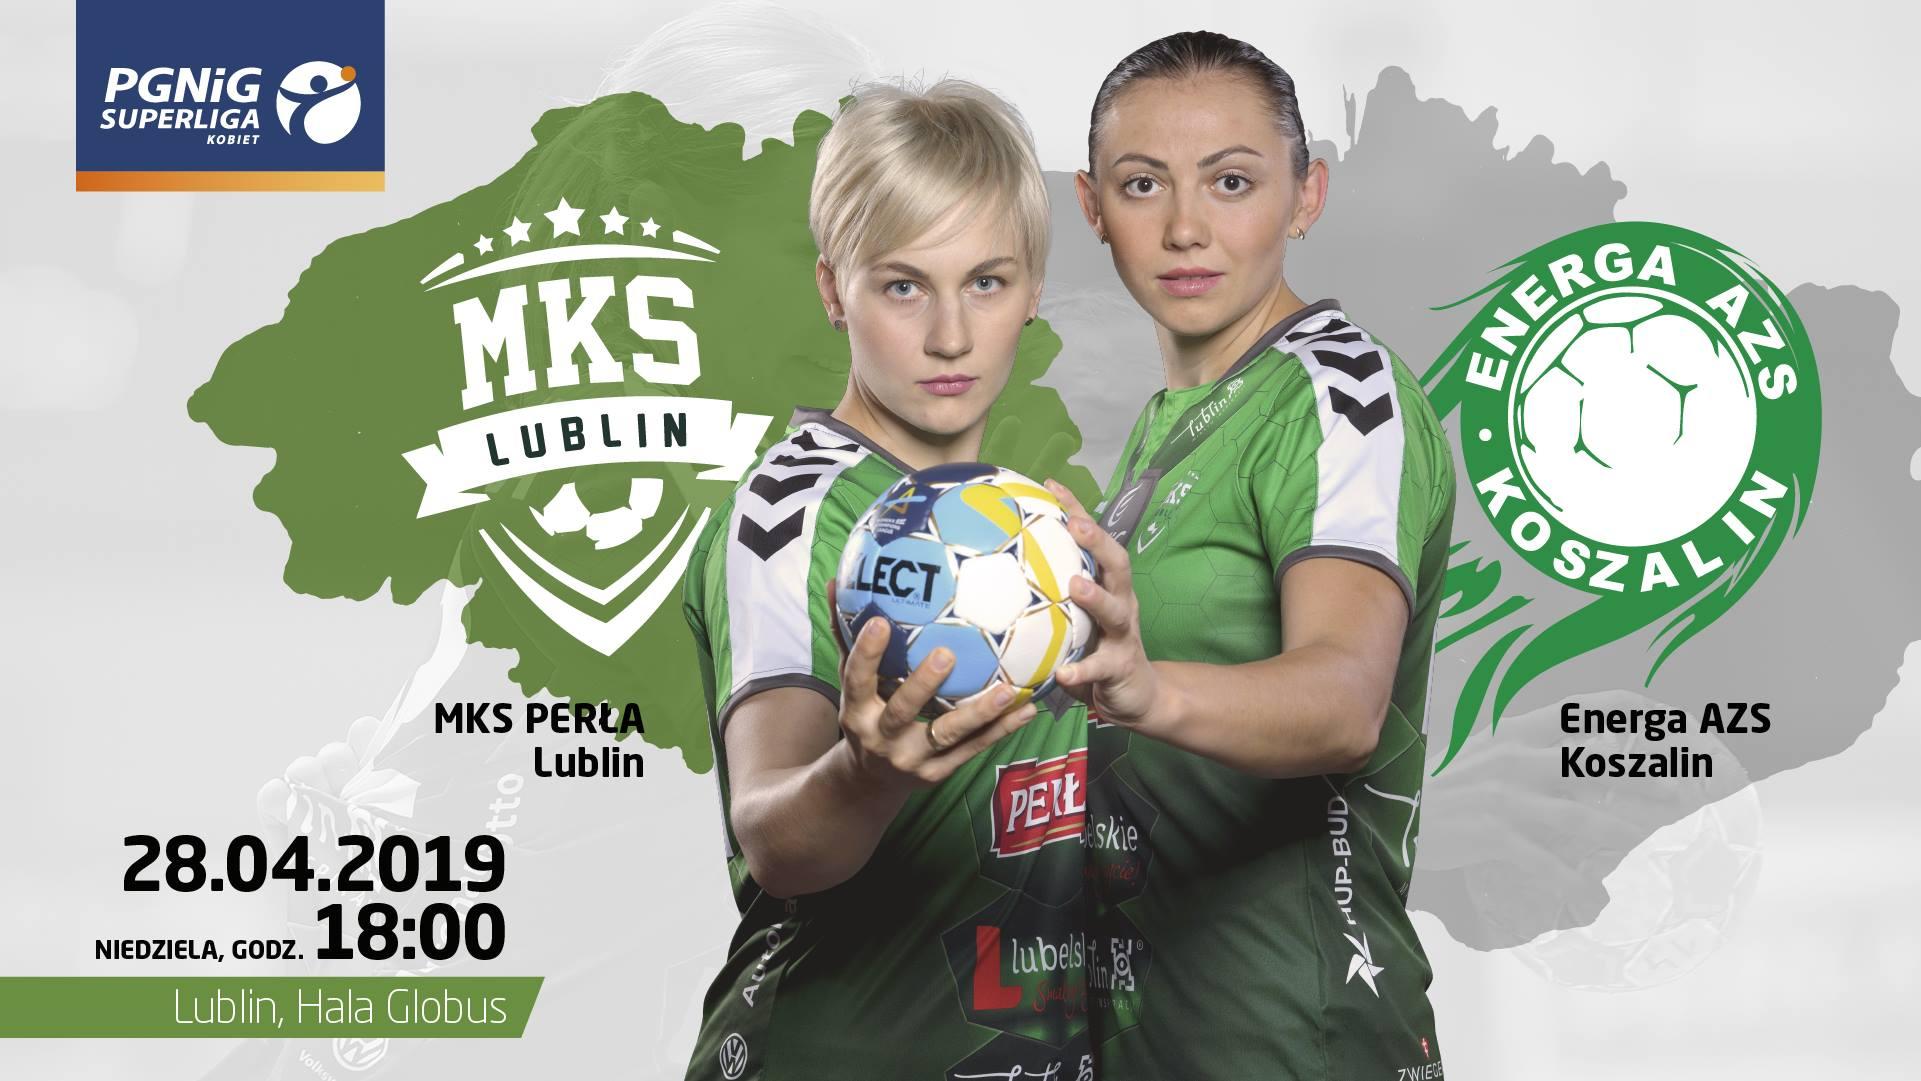 MKS Perła Lublin - Energa AZS Koszalin 24:18